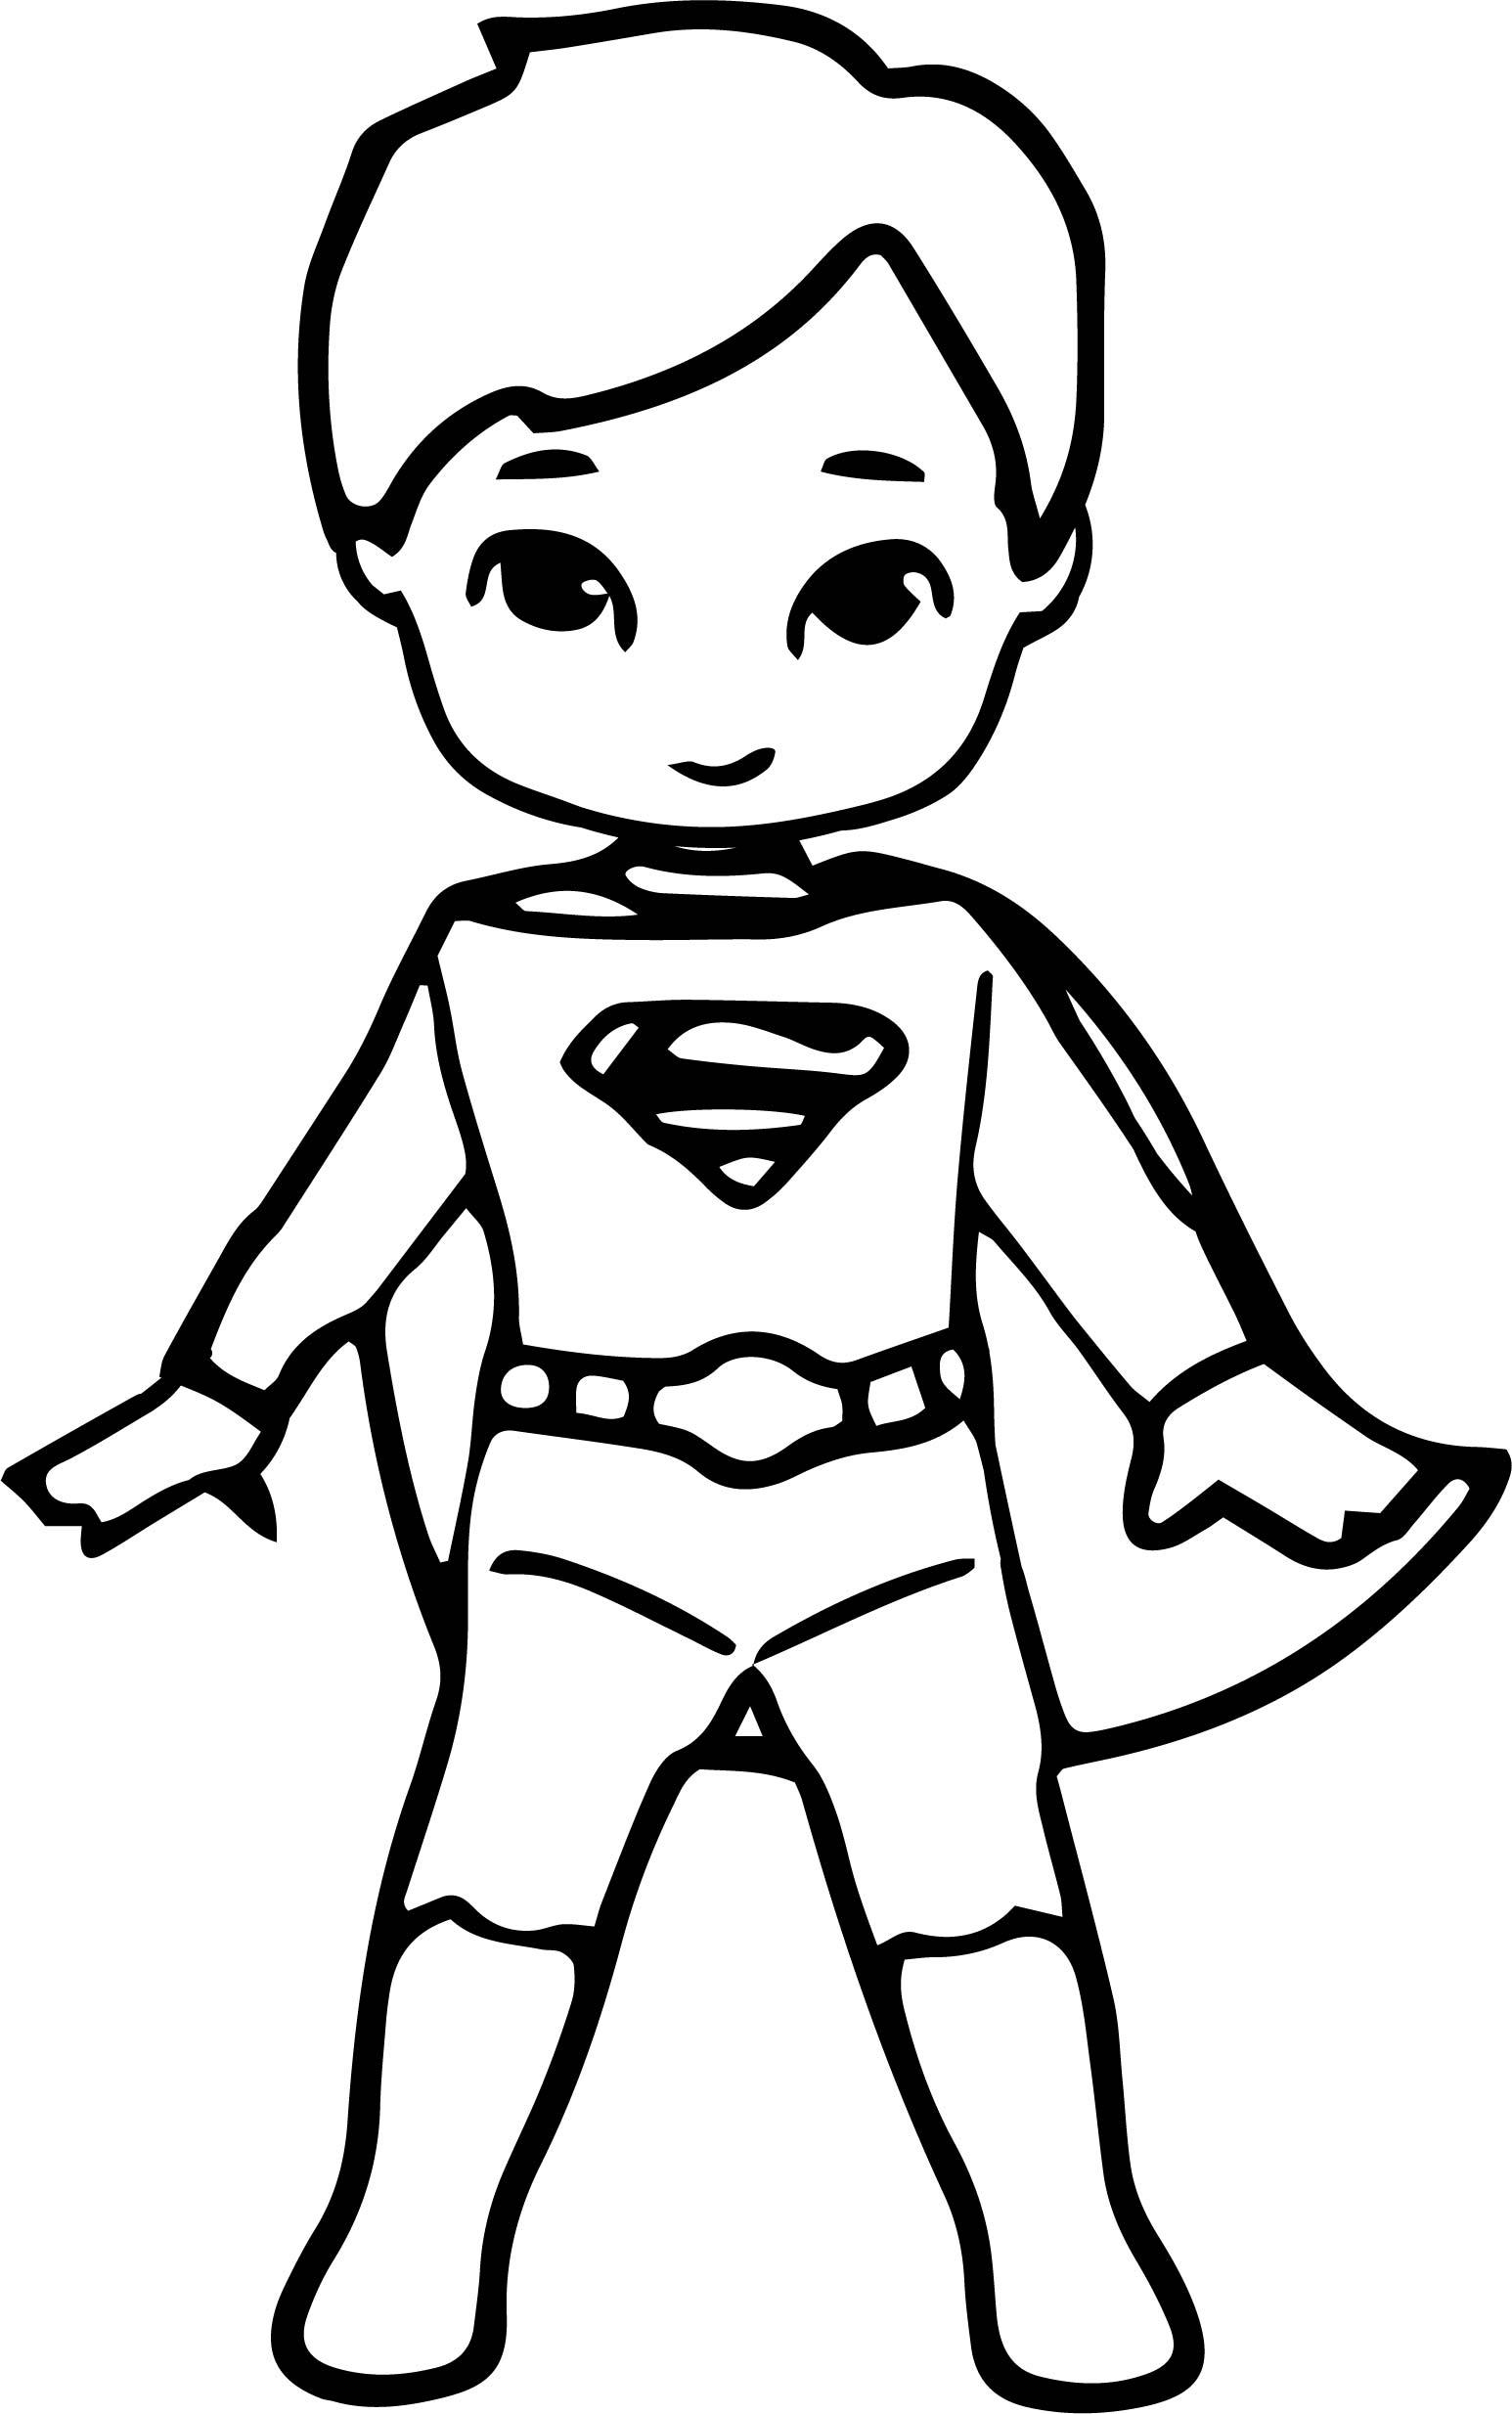 Waiting Cartoon Superhero Superman Kid Coloring Page Wecoloringpage